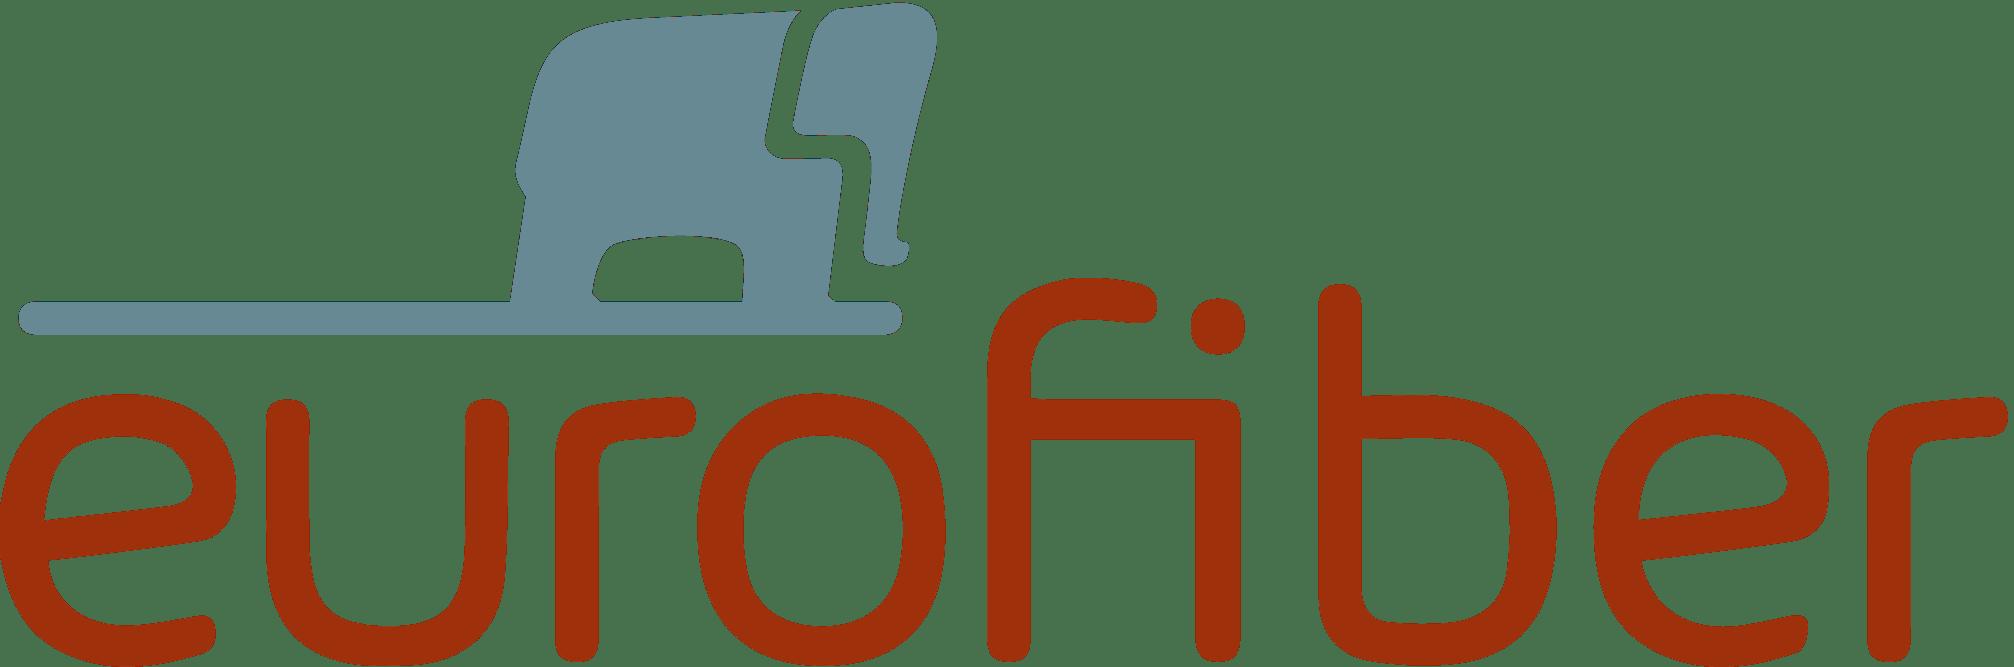 Eurofiber logo